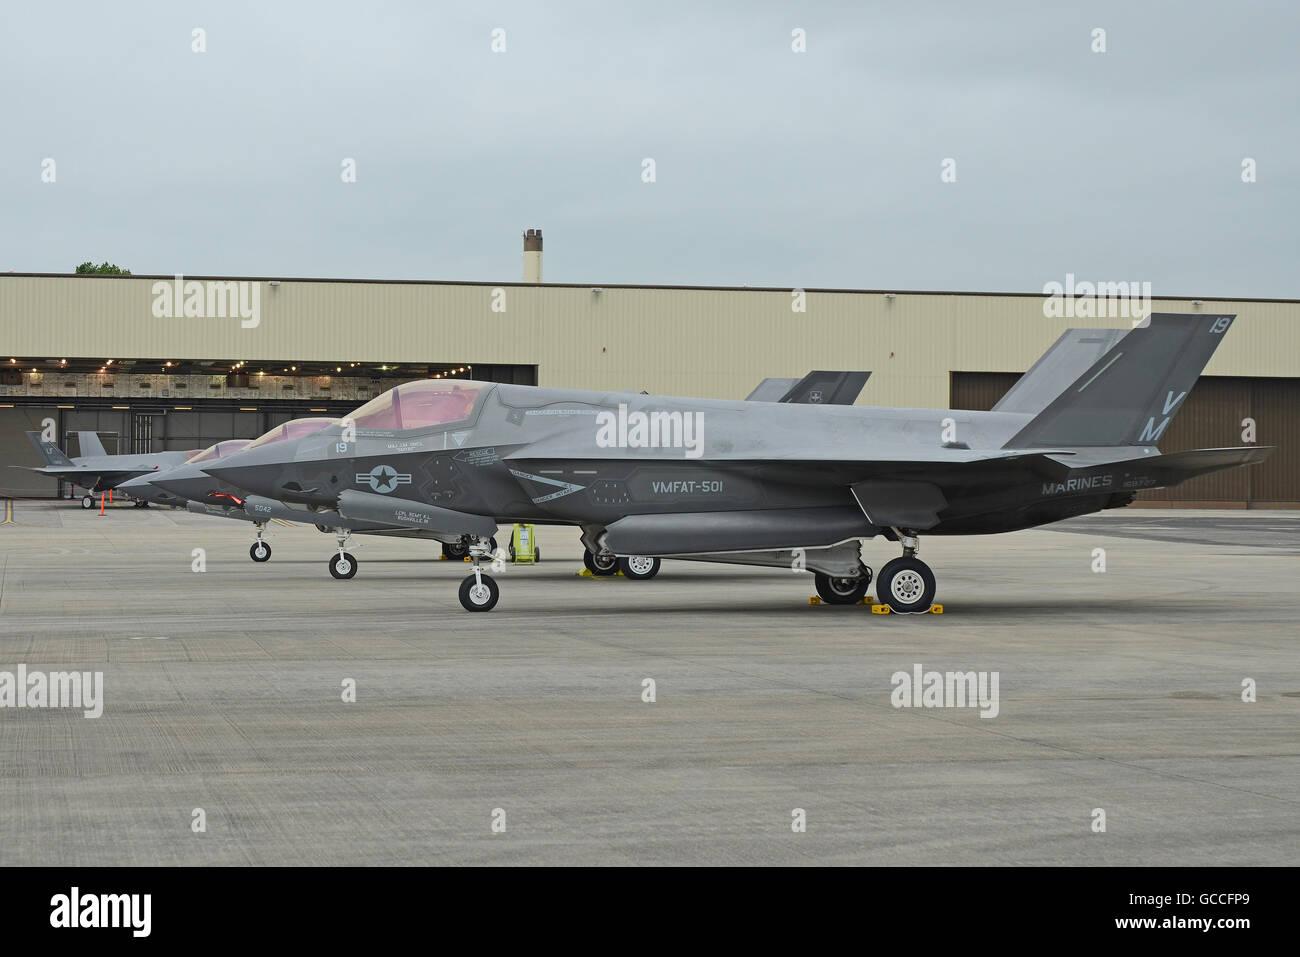 Lockheed Martin F-35 Lightning II fighter jets lined up - Stock Image